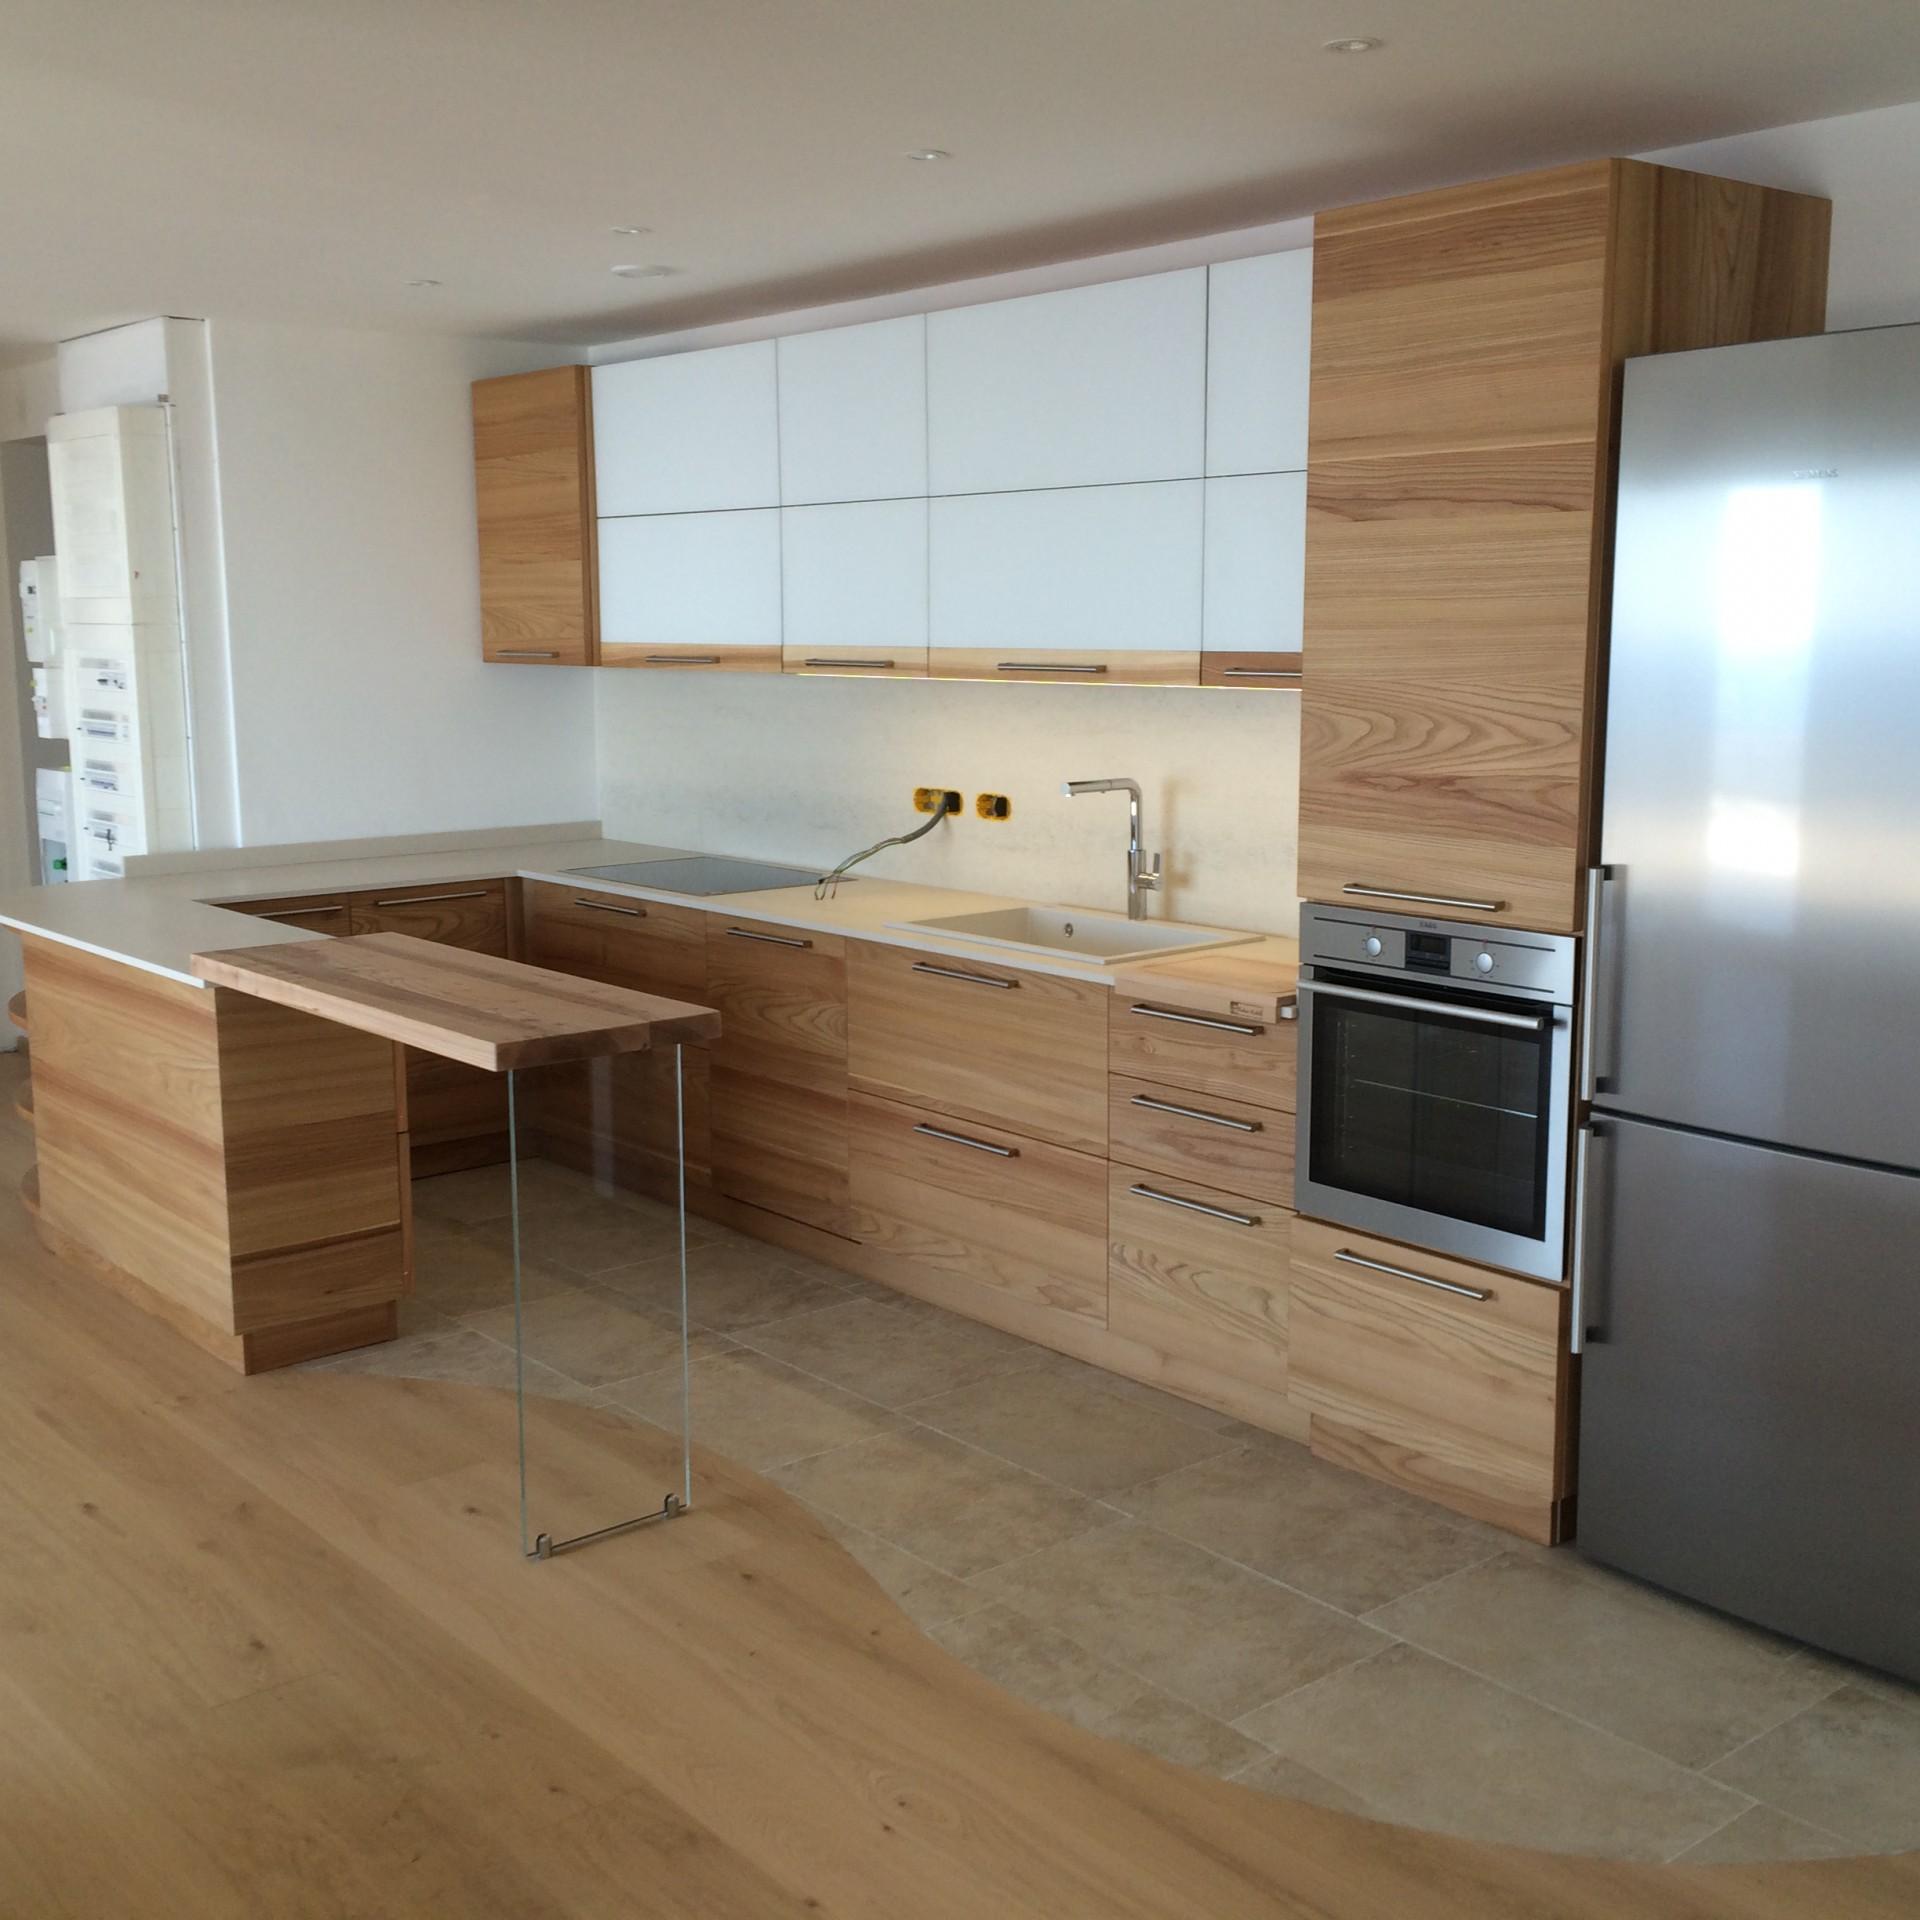 Cucina moderna a modena fadini mobili cerea verona - Isole cucine moderne ...